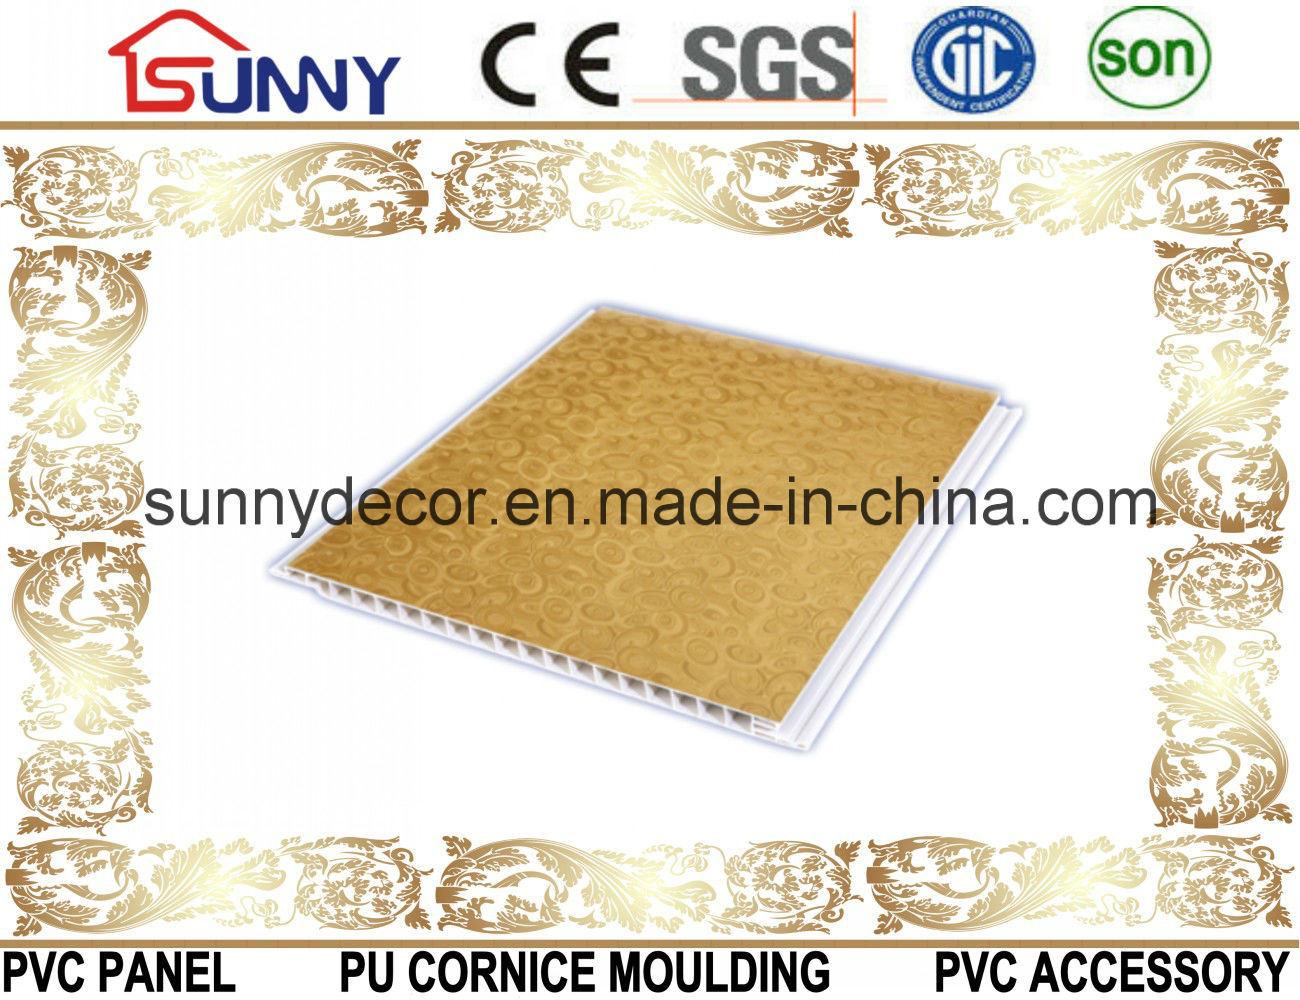 Laminated Interior PVC Wall Panel & PVC Ceiling Board